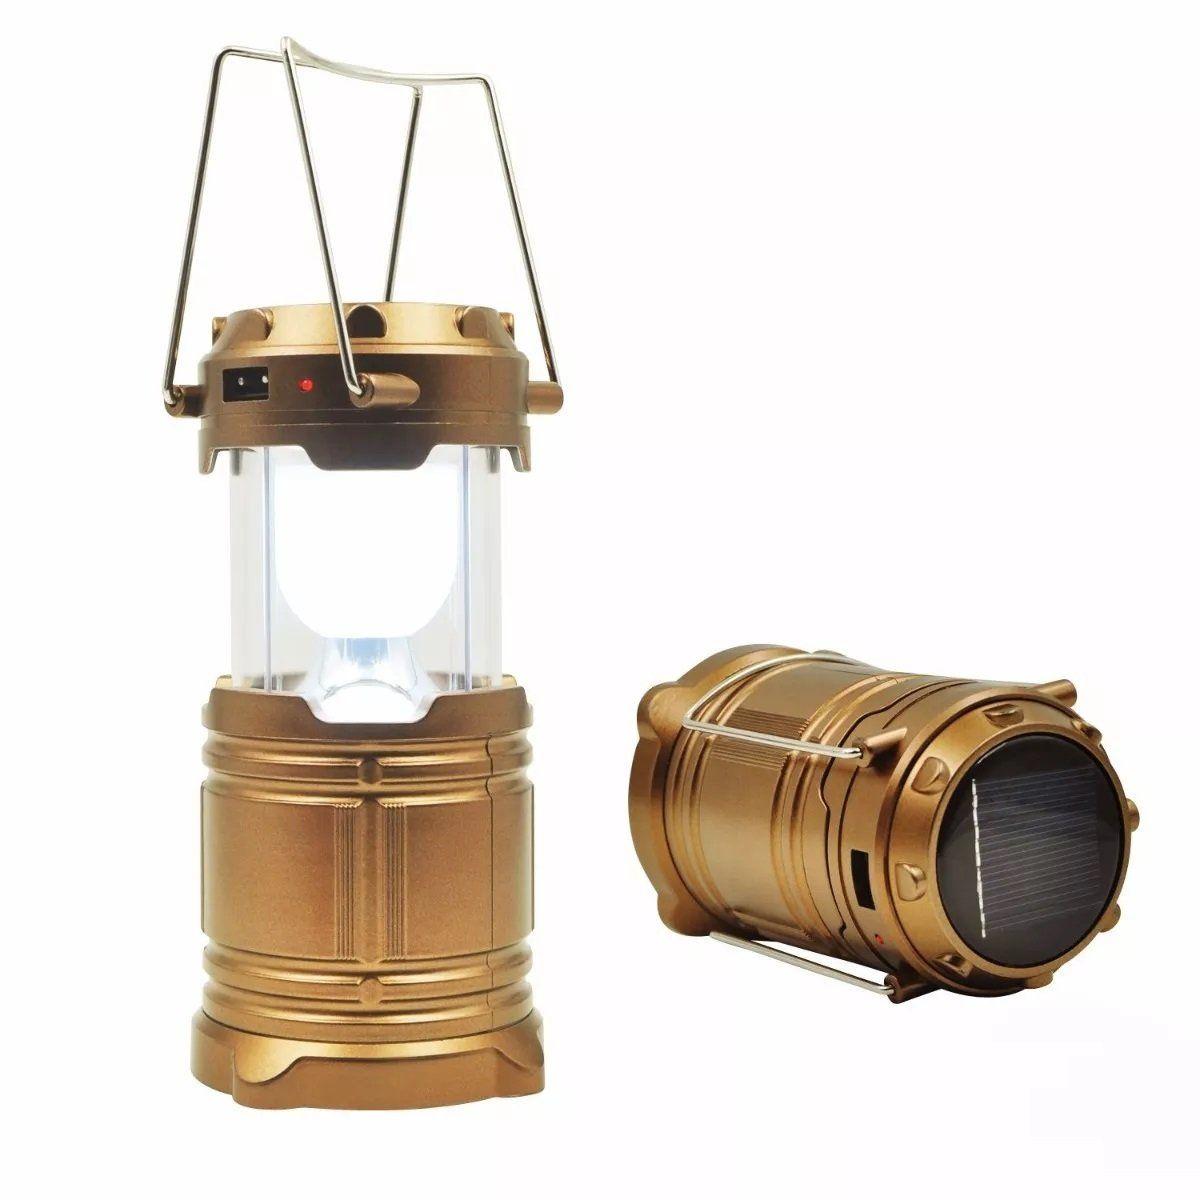 Kit 3 Mini Lampiao Luminaria Lanterna Solar De Led Carrega Celular Lanternas Solares Lampiao Lanterna